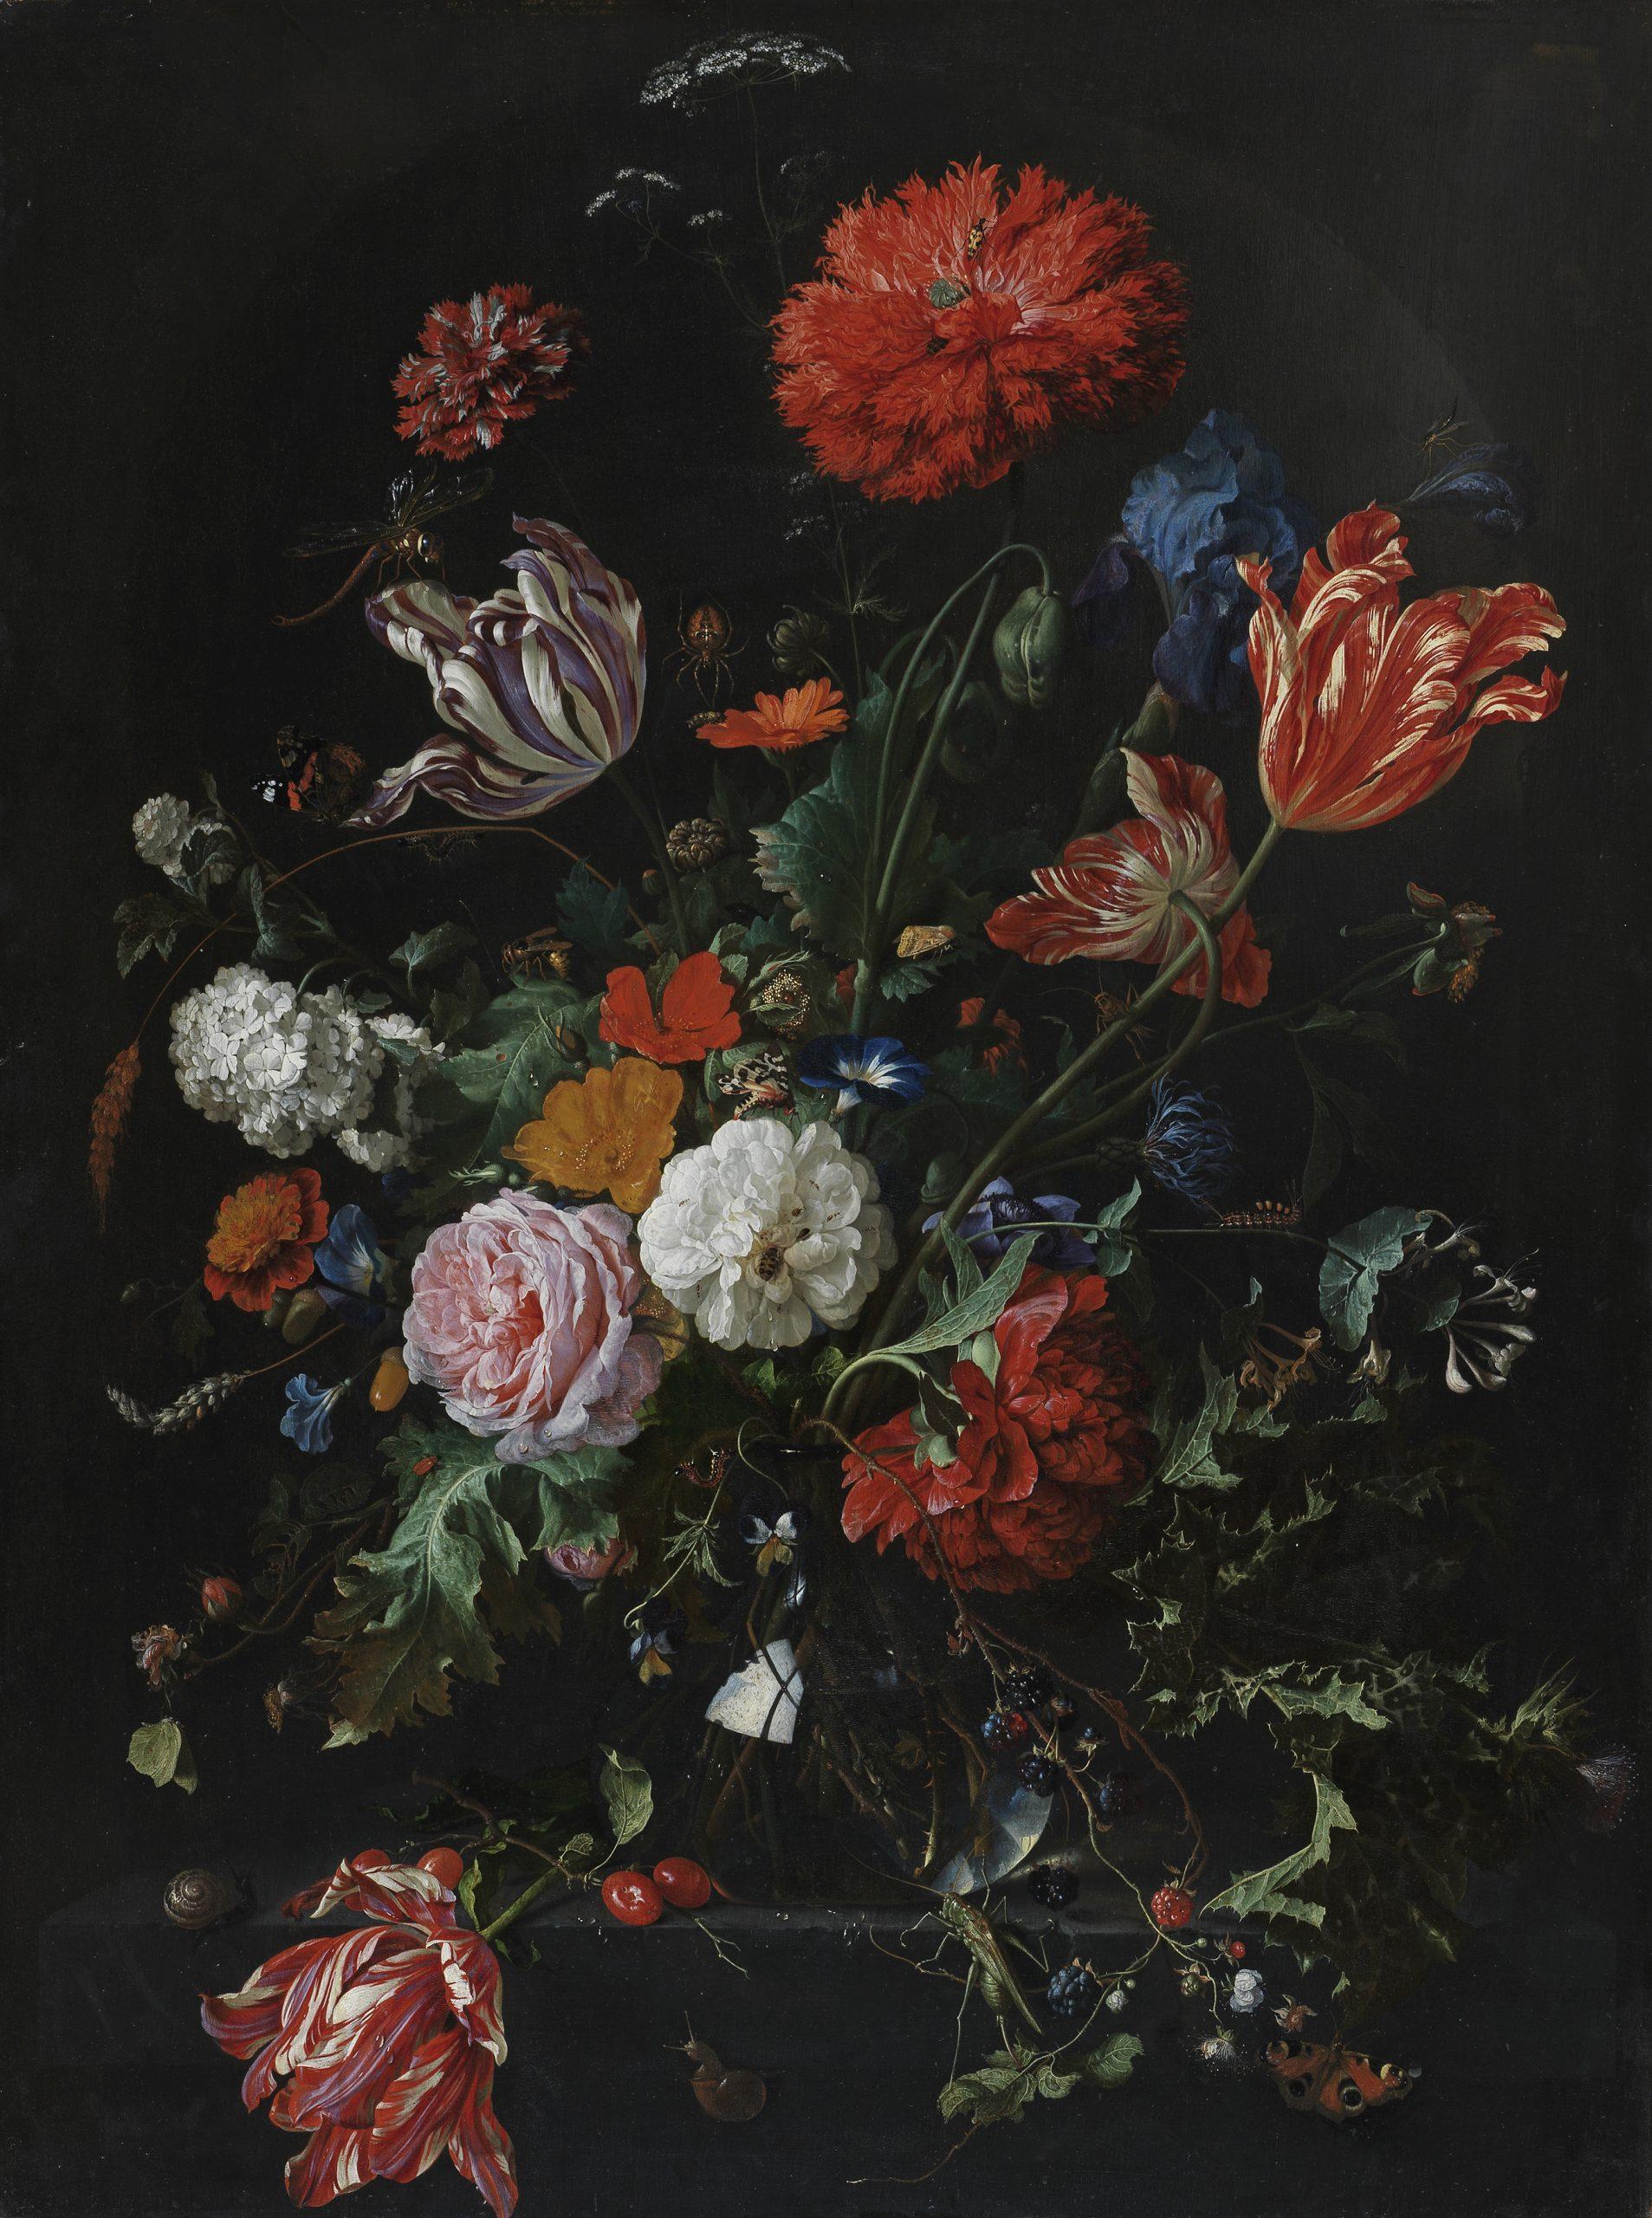 Flowers in a Glass Vase by Jan Davidsz. de Heem, (Dutch, 1606-1683/4). Oil on panel, height 93.2 cm, width 69.6 cm. Dutch/Flemish School (c) The Fitzwilliam Museum, Cambridge